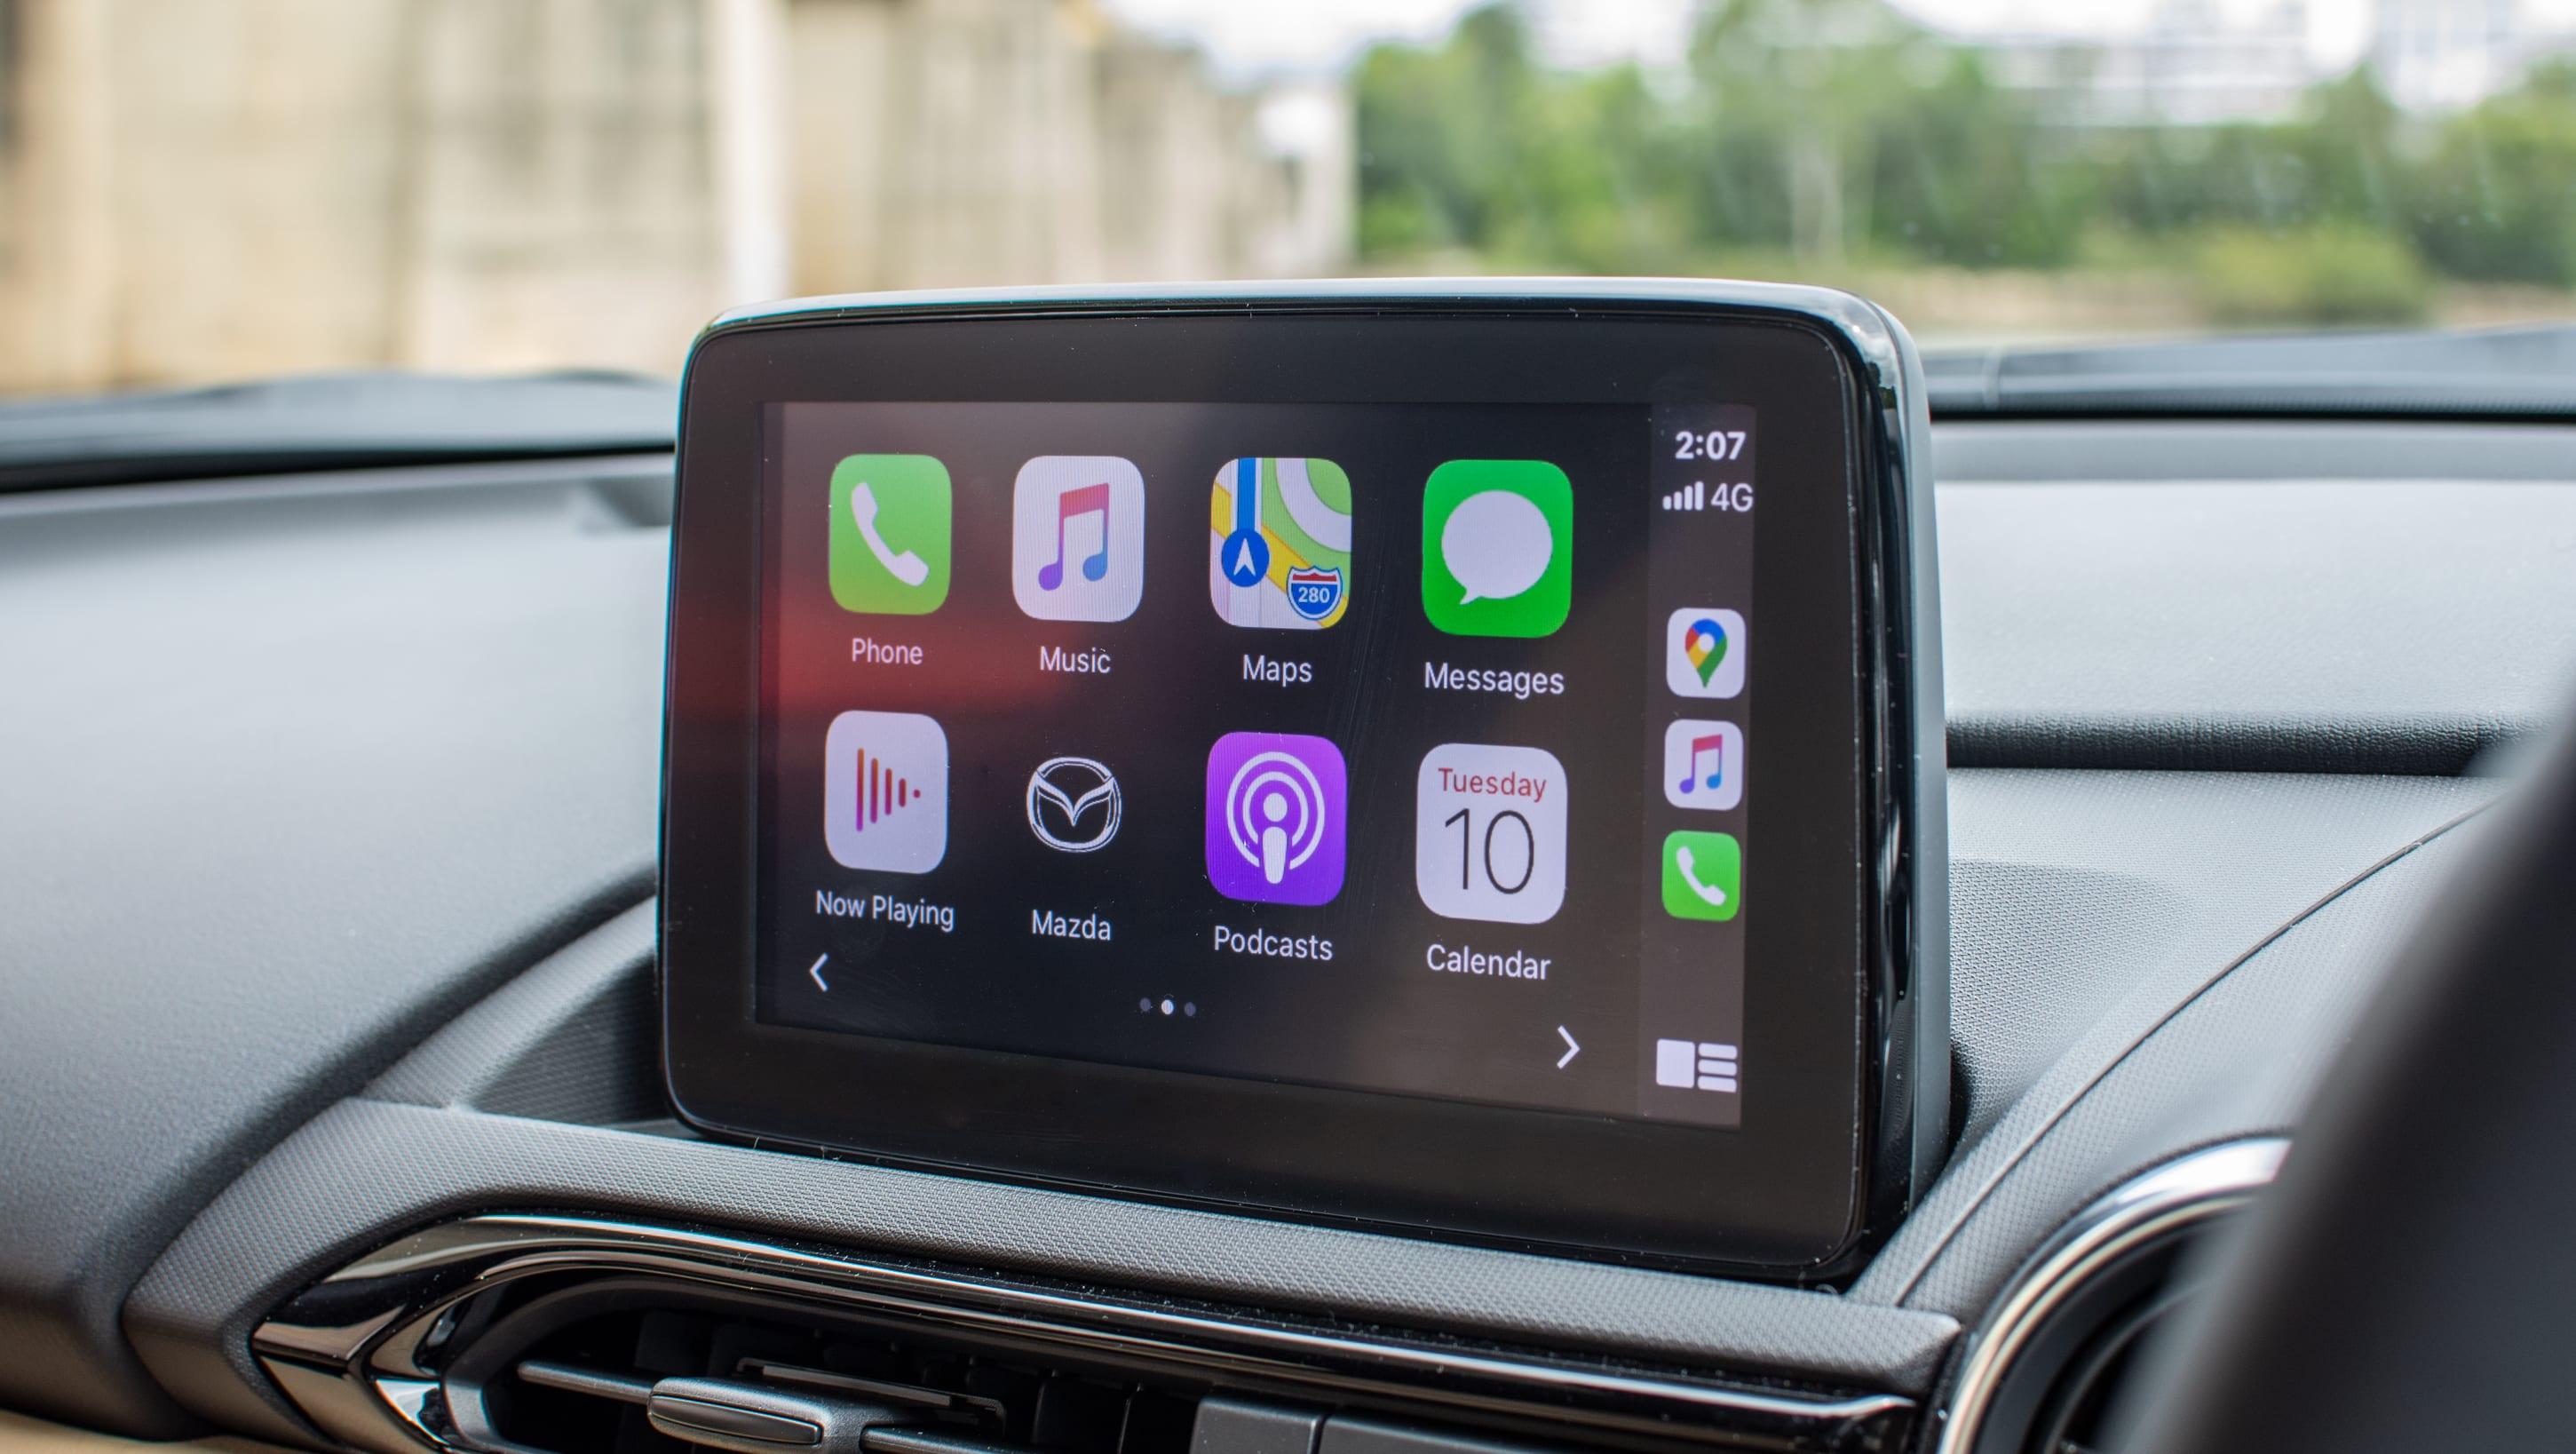 Kelebihan Kekurangan Android Auto Mazda 3 Tangguh